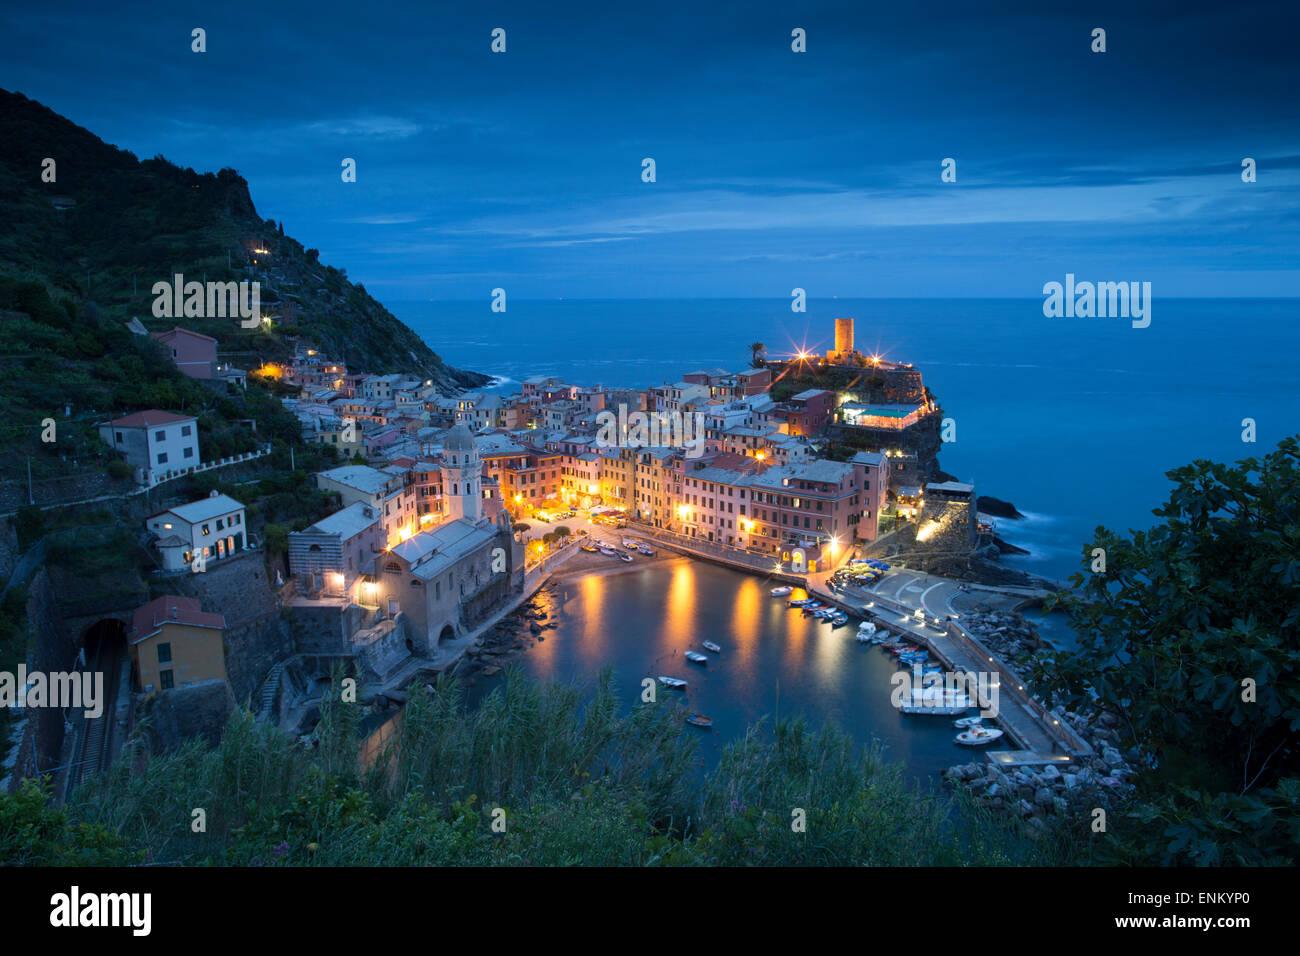 La Riviera Italienne représente la vie simple de l'océan. Photo Stock